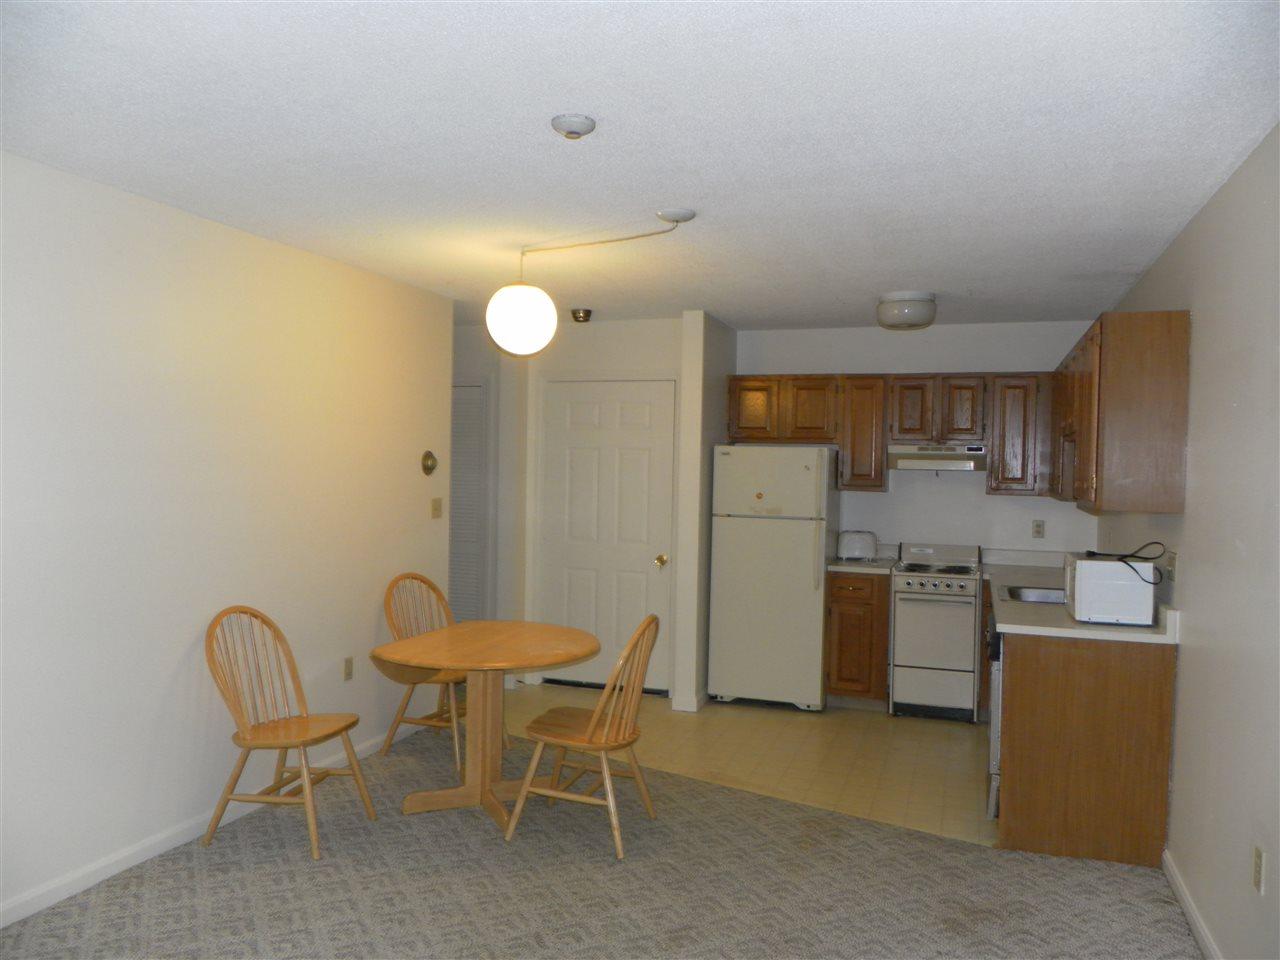 264 Main St. Street B, Lincoln, NH 03251